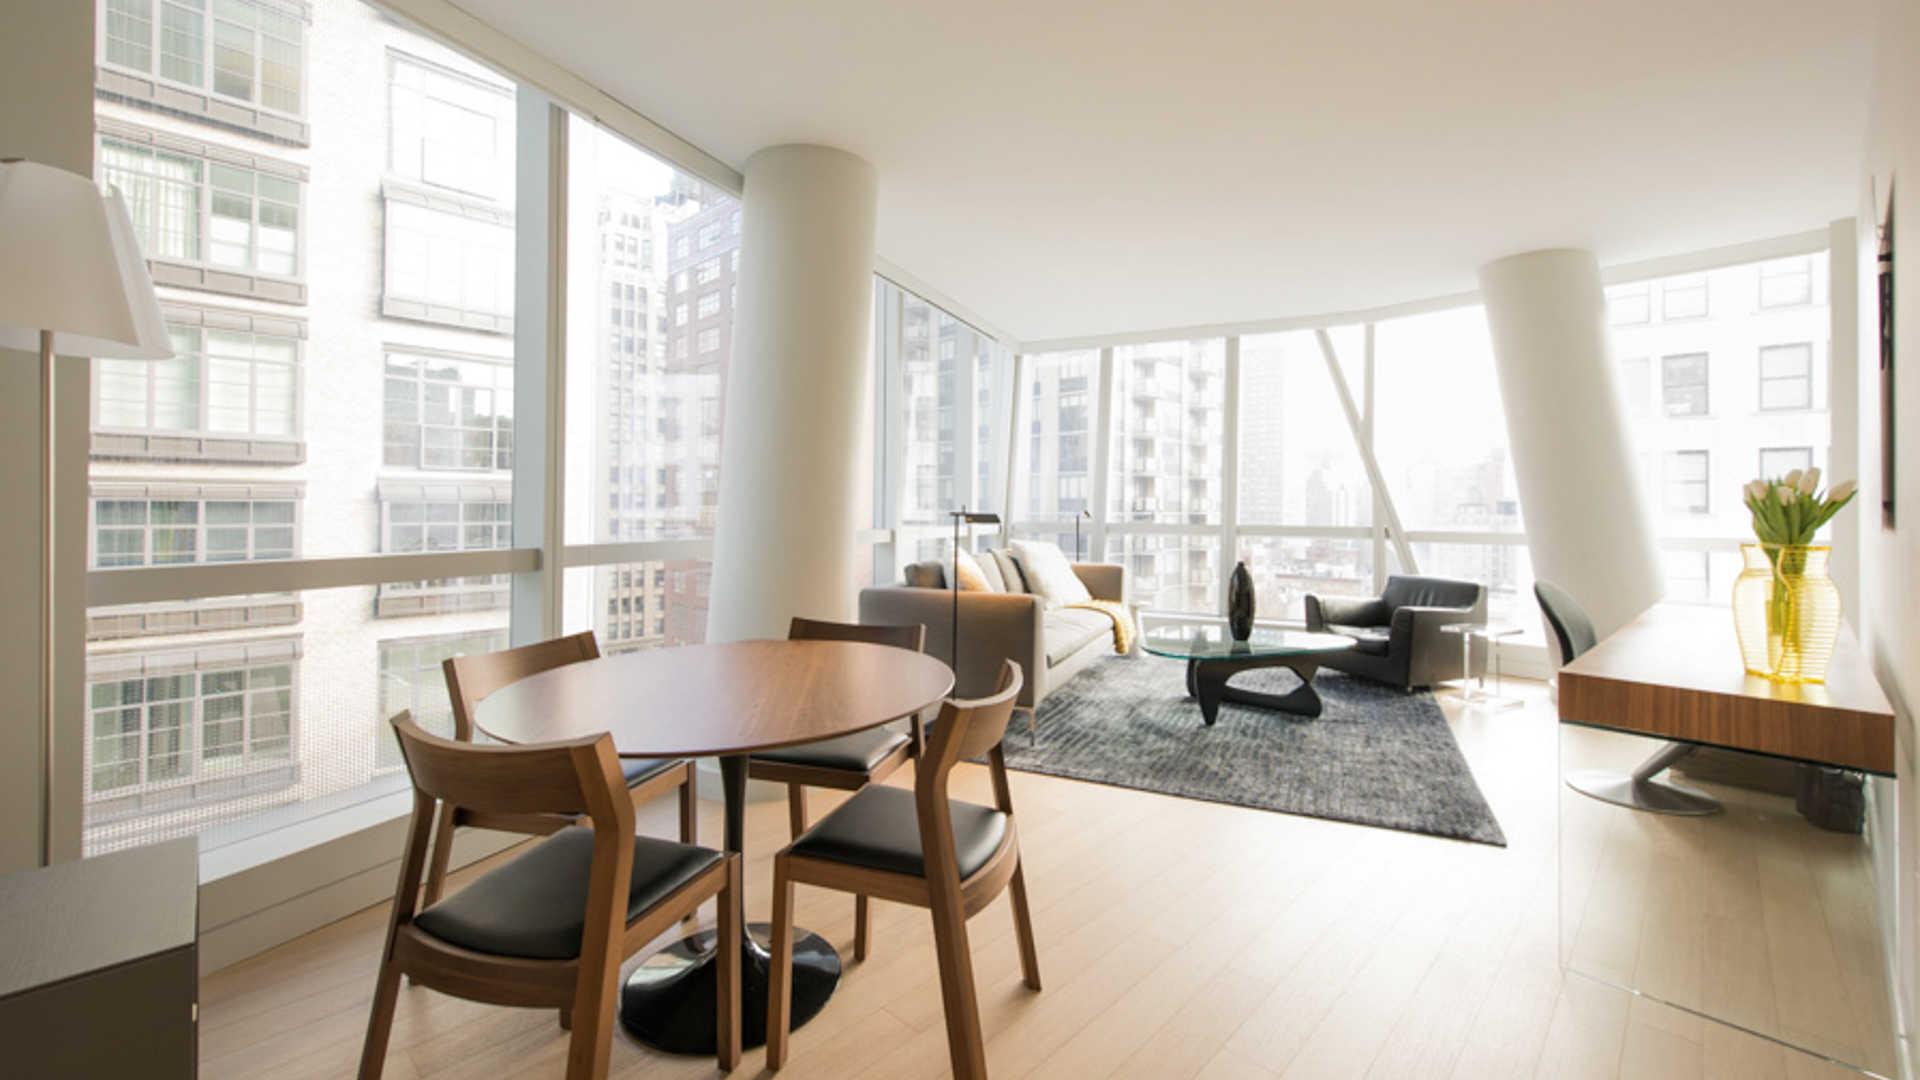 Living Room with White Oak Wood Floor